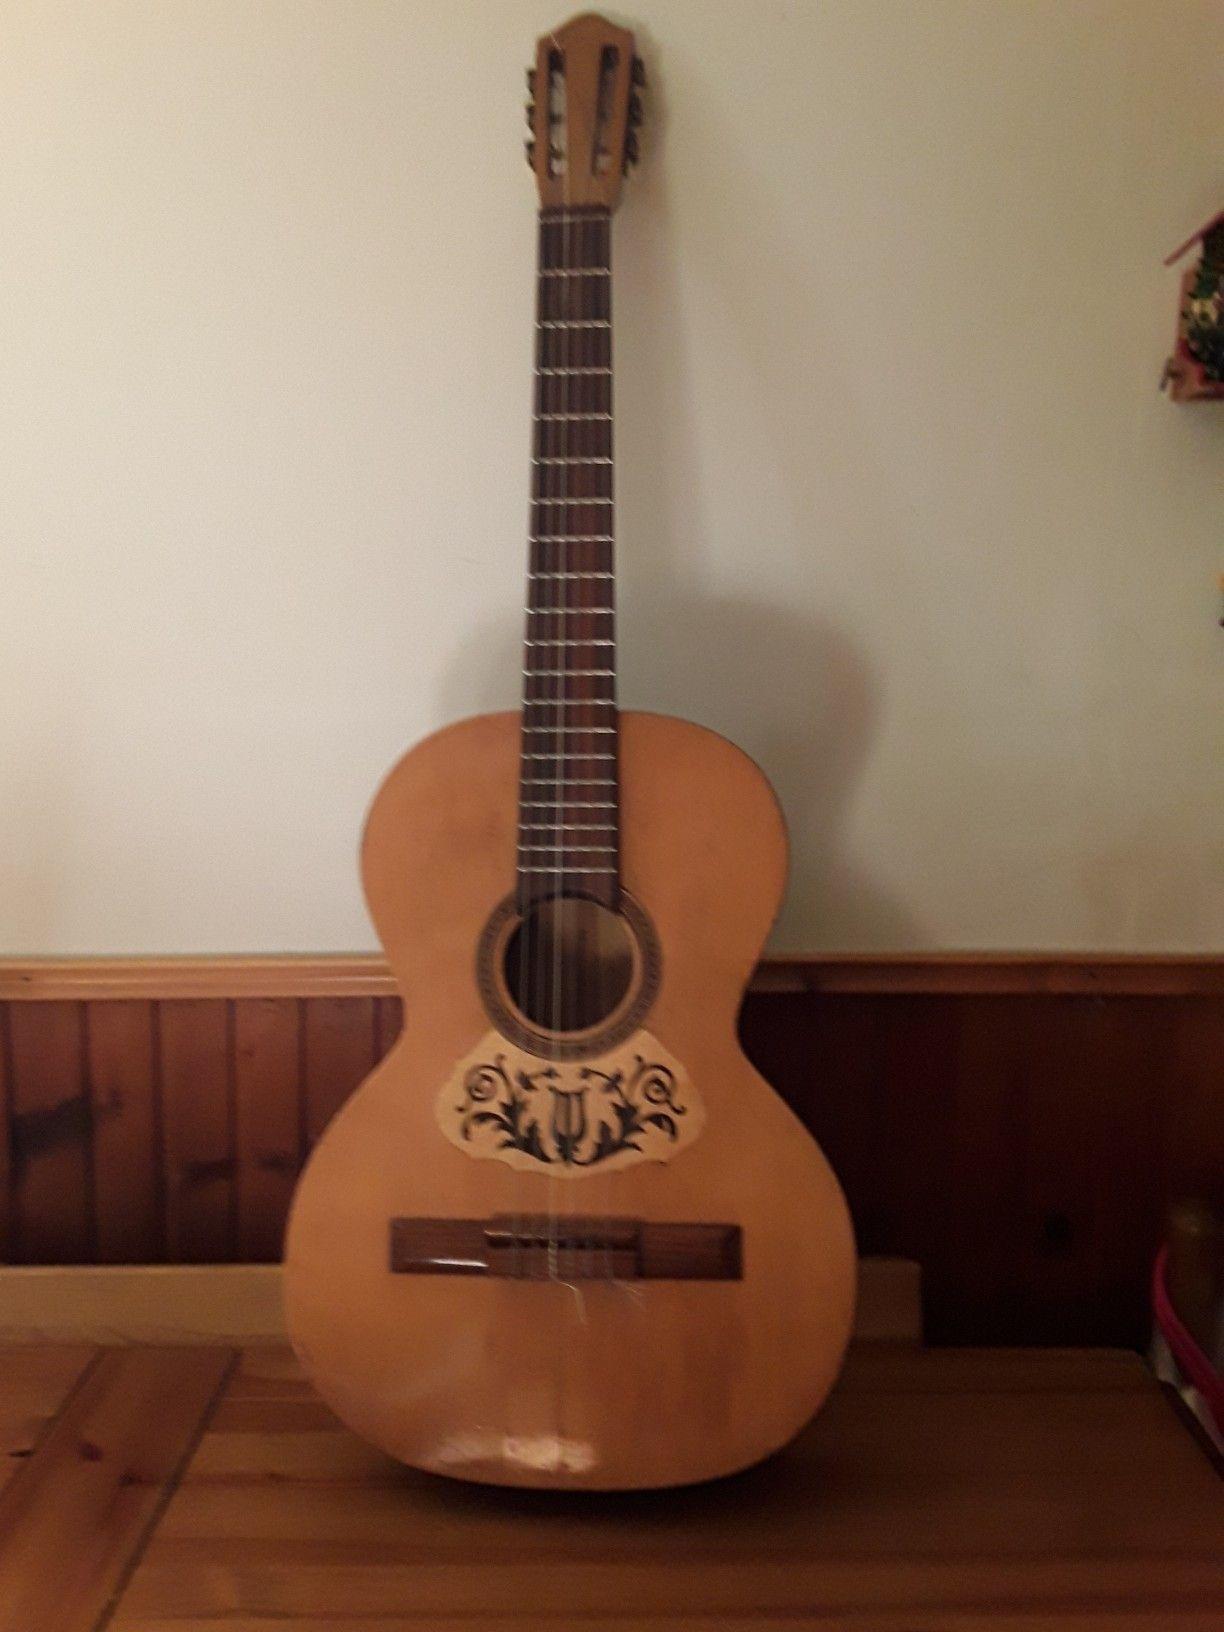 Cose Di Casa Carate chitarra enrico ventura - carate b.za inizio '900. | chitarra